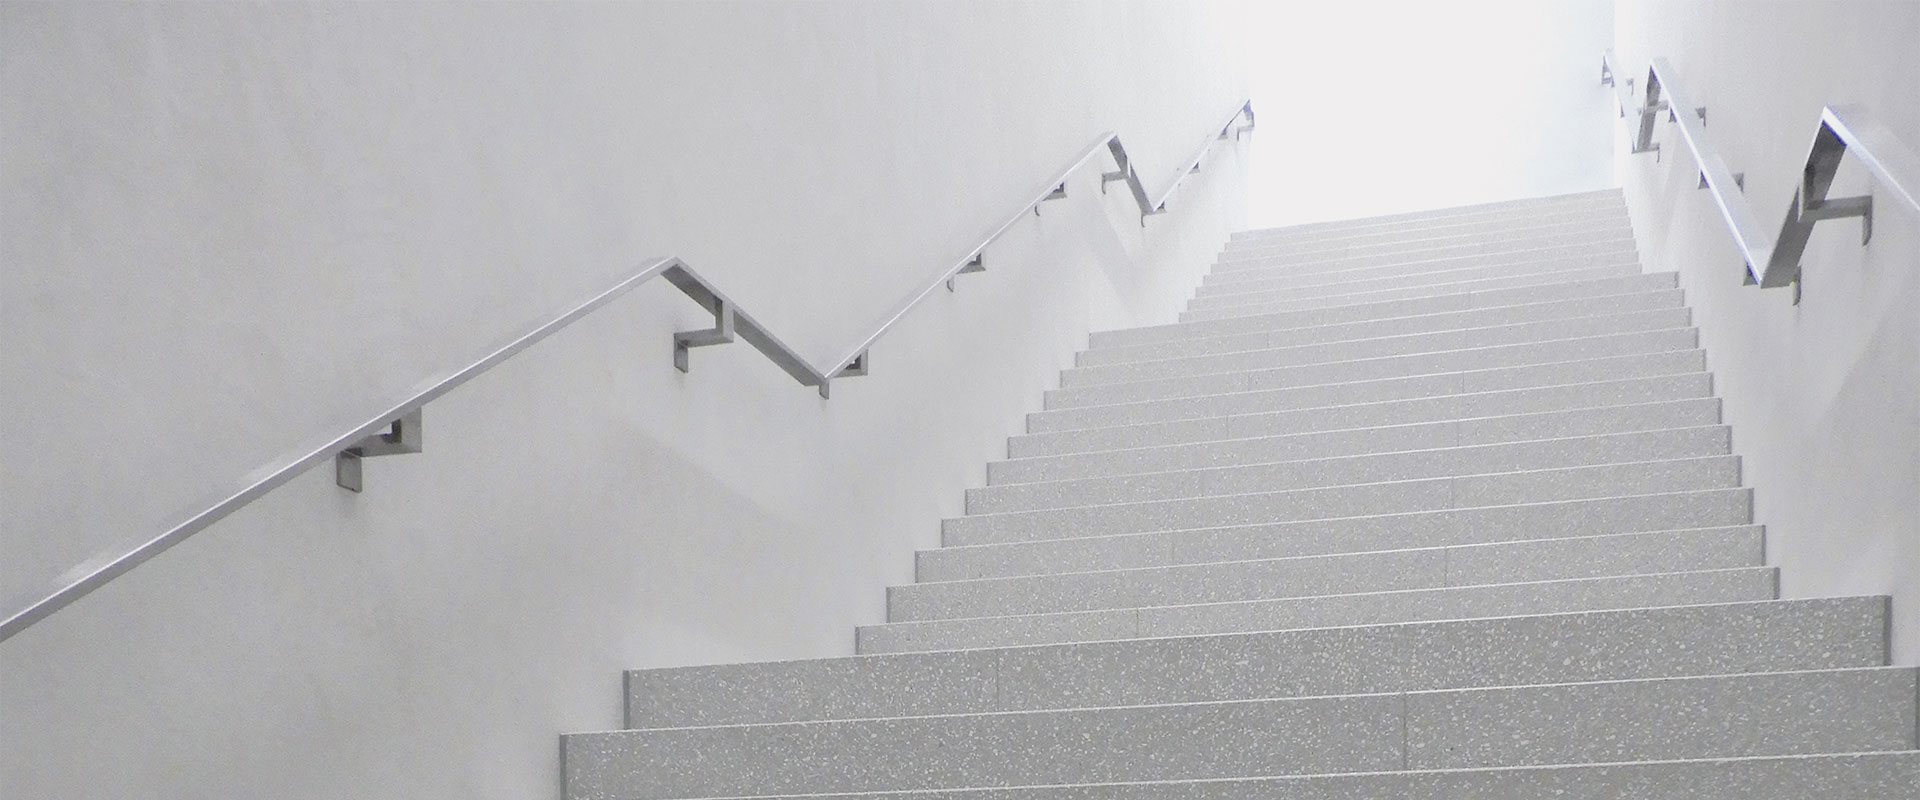 musee cantonal des beaux-arts - losanna switzerland - custom REG 3620 - pubblico 02 - OK